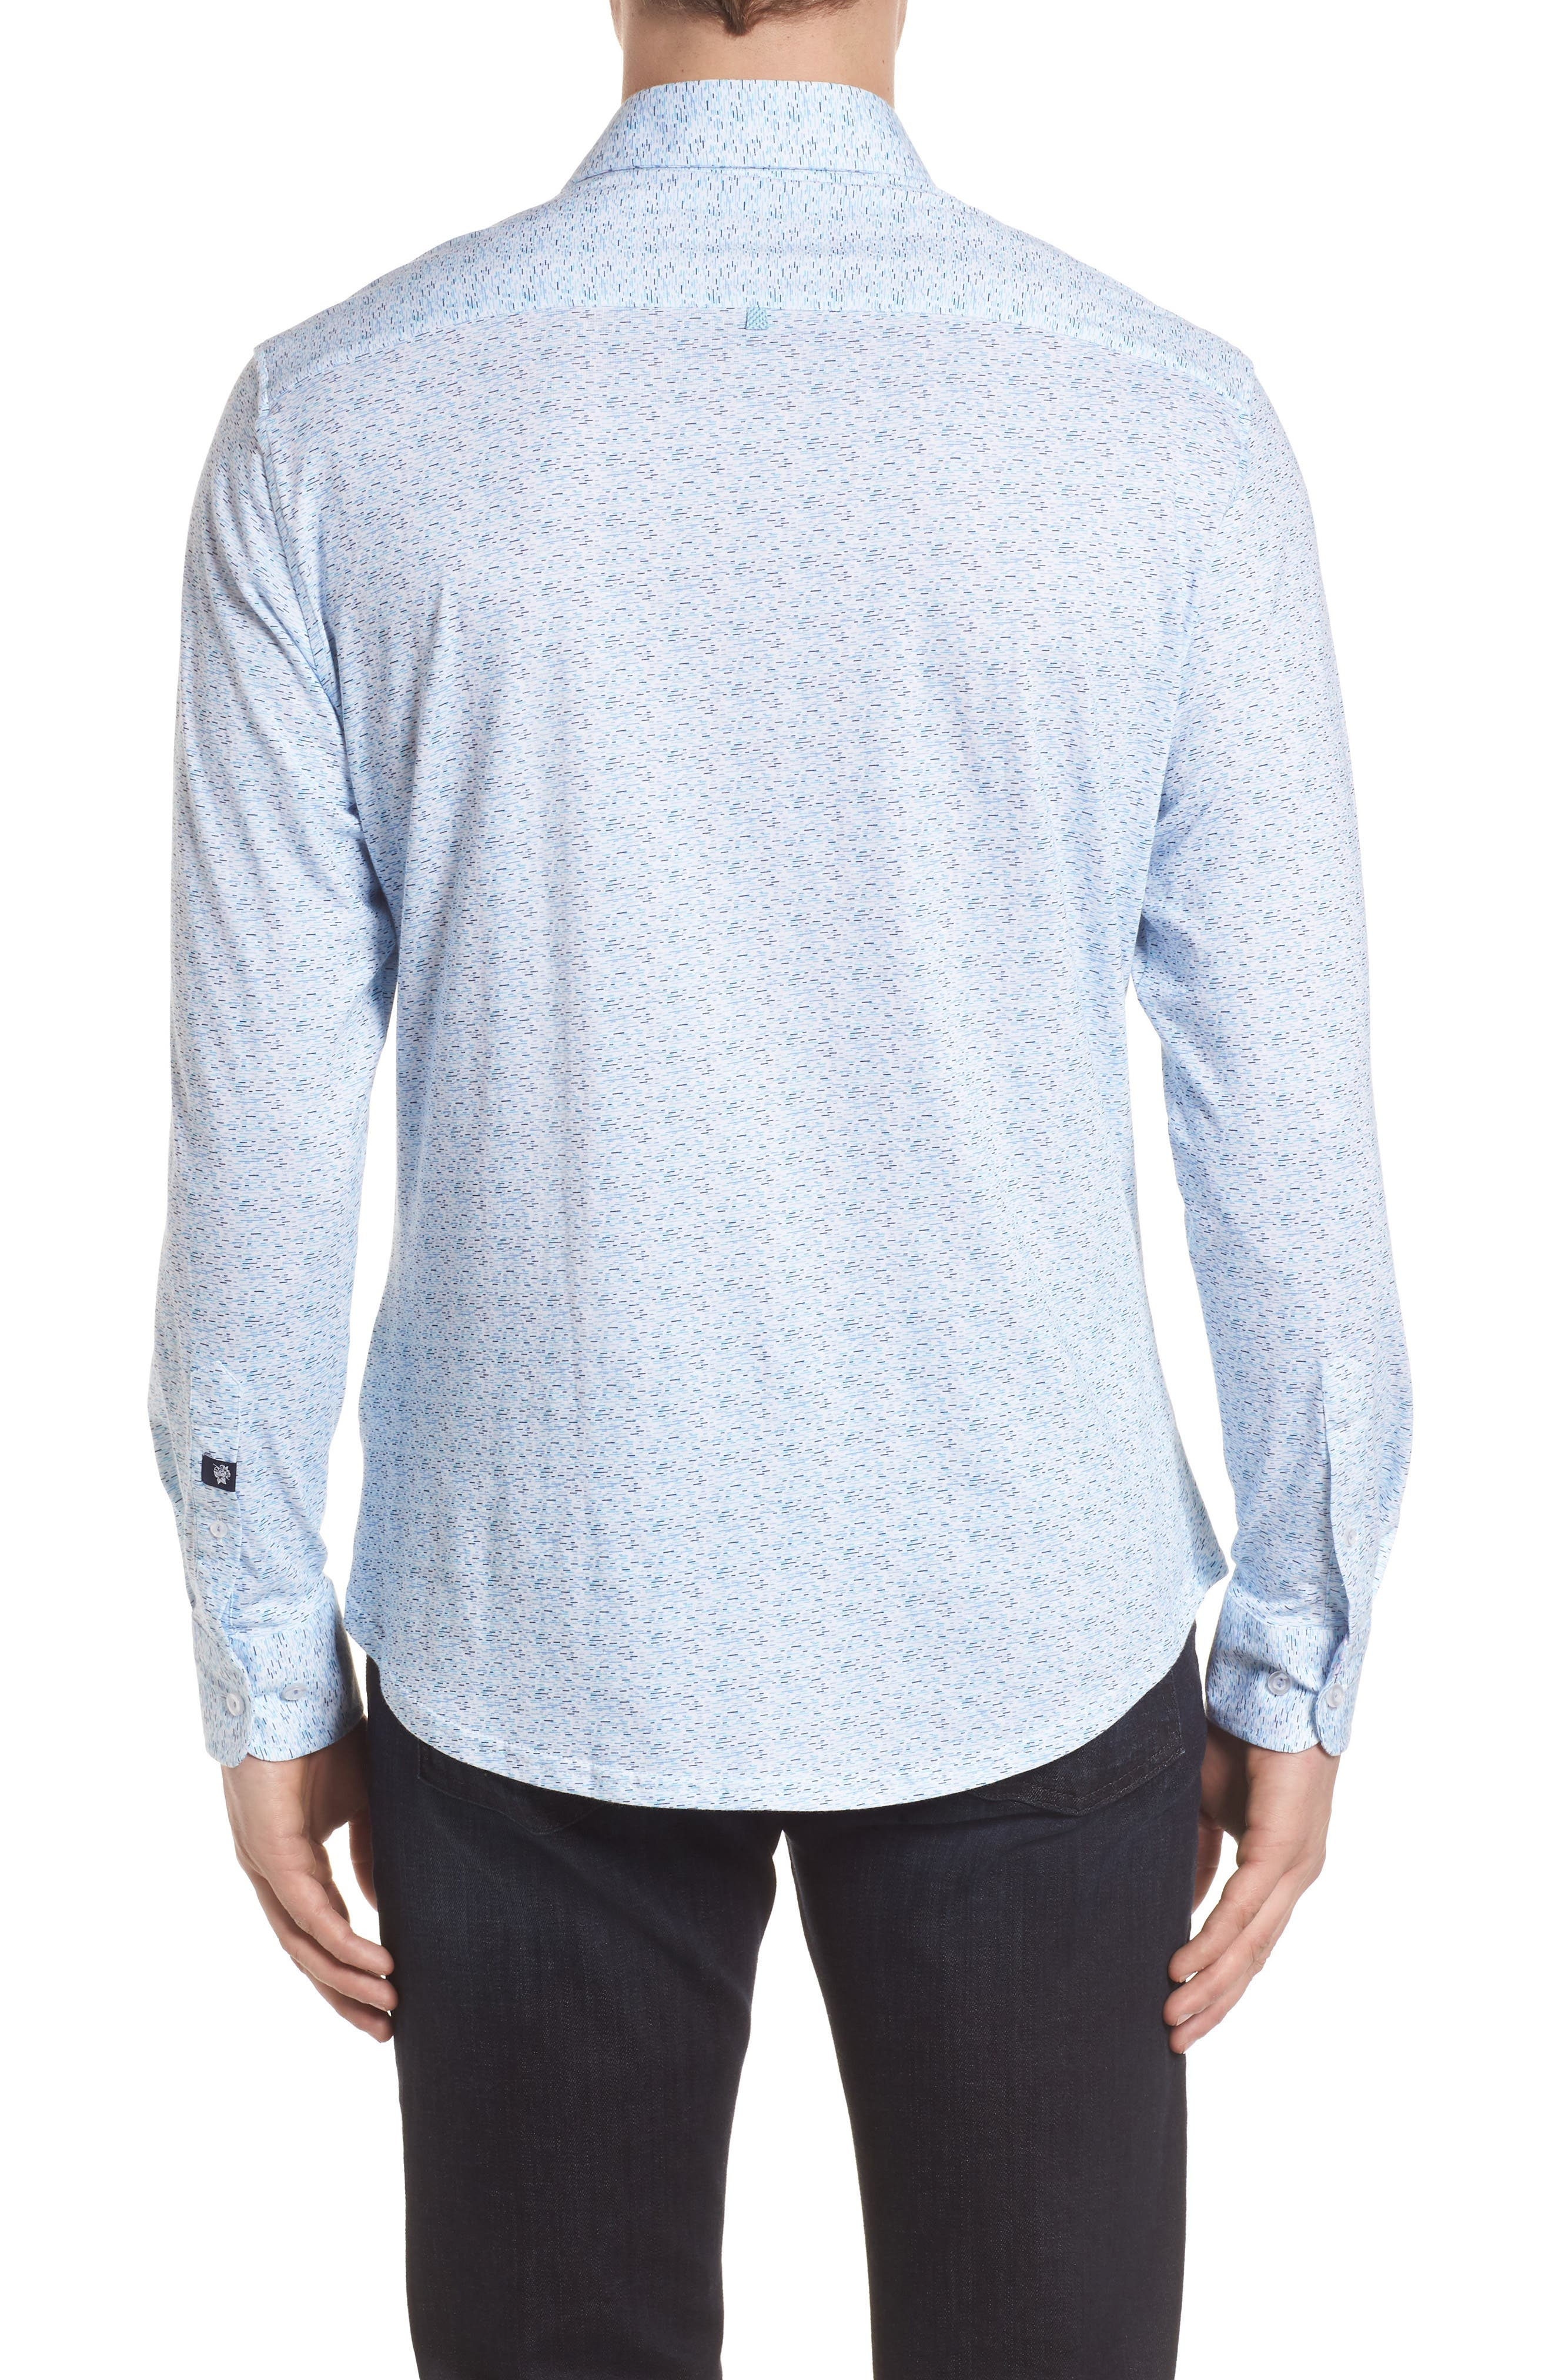 STONE ROSE,                             Contemporary Fit Print Sport Shirt,                             Alternate thumbnail 2, color,                             400